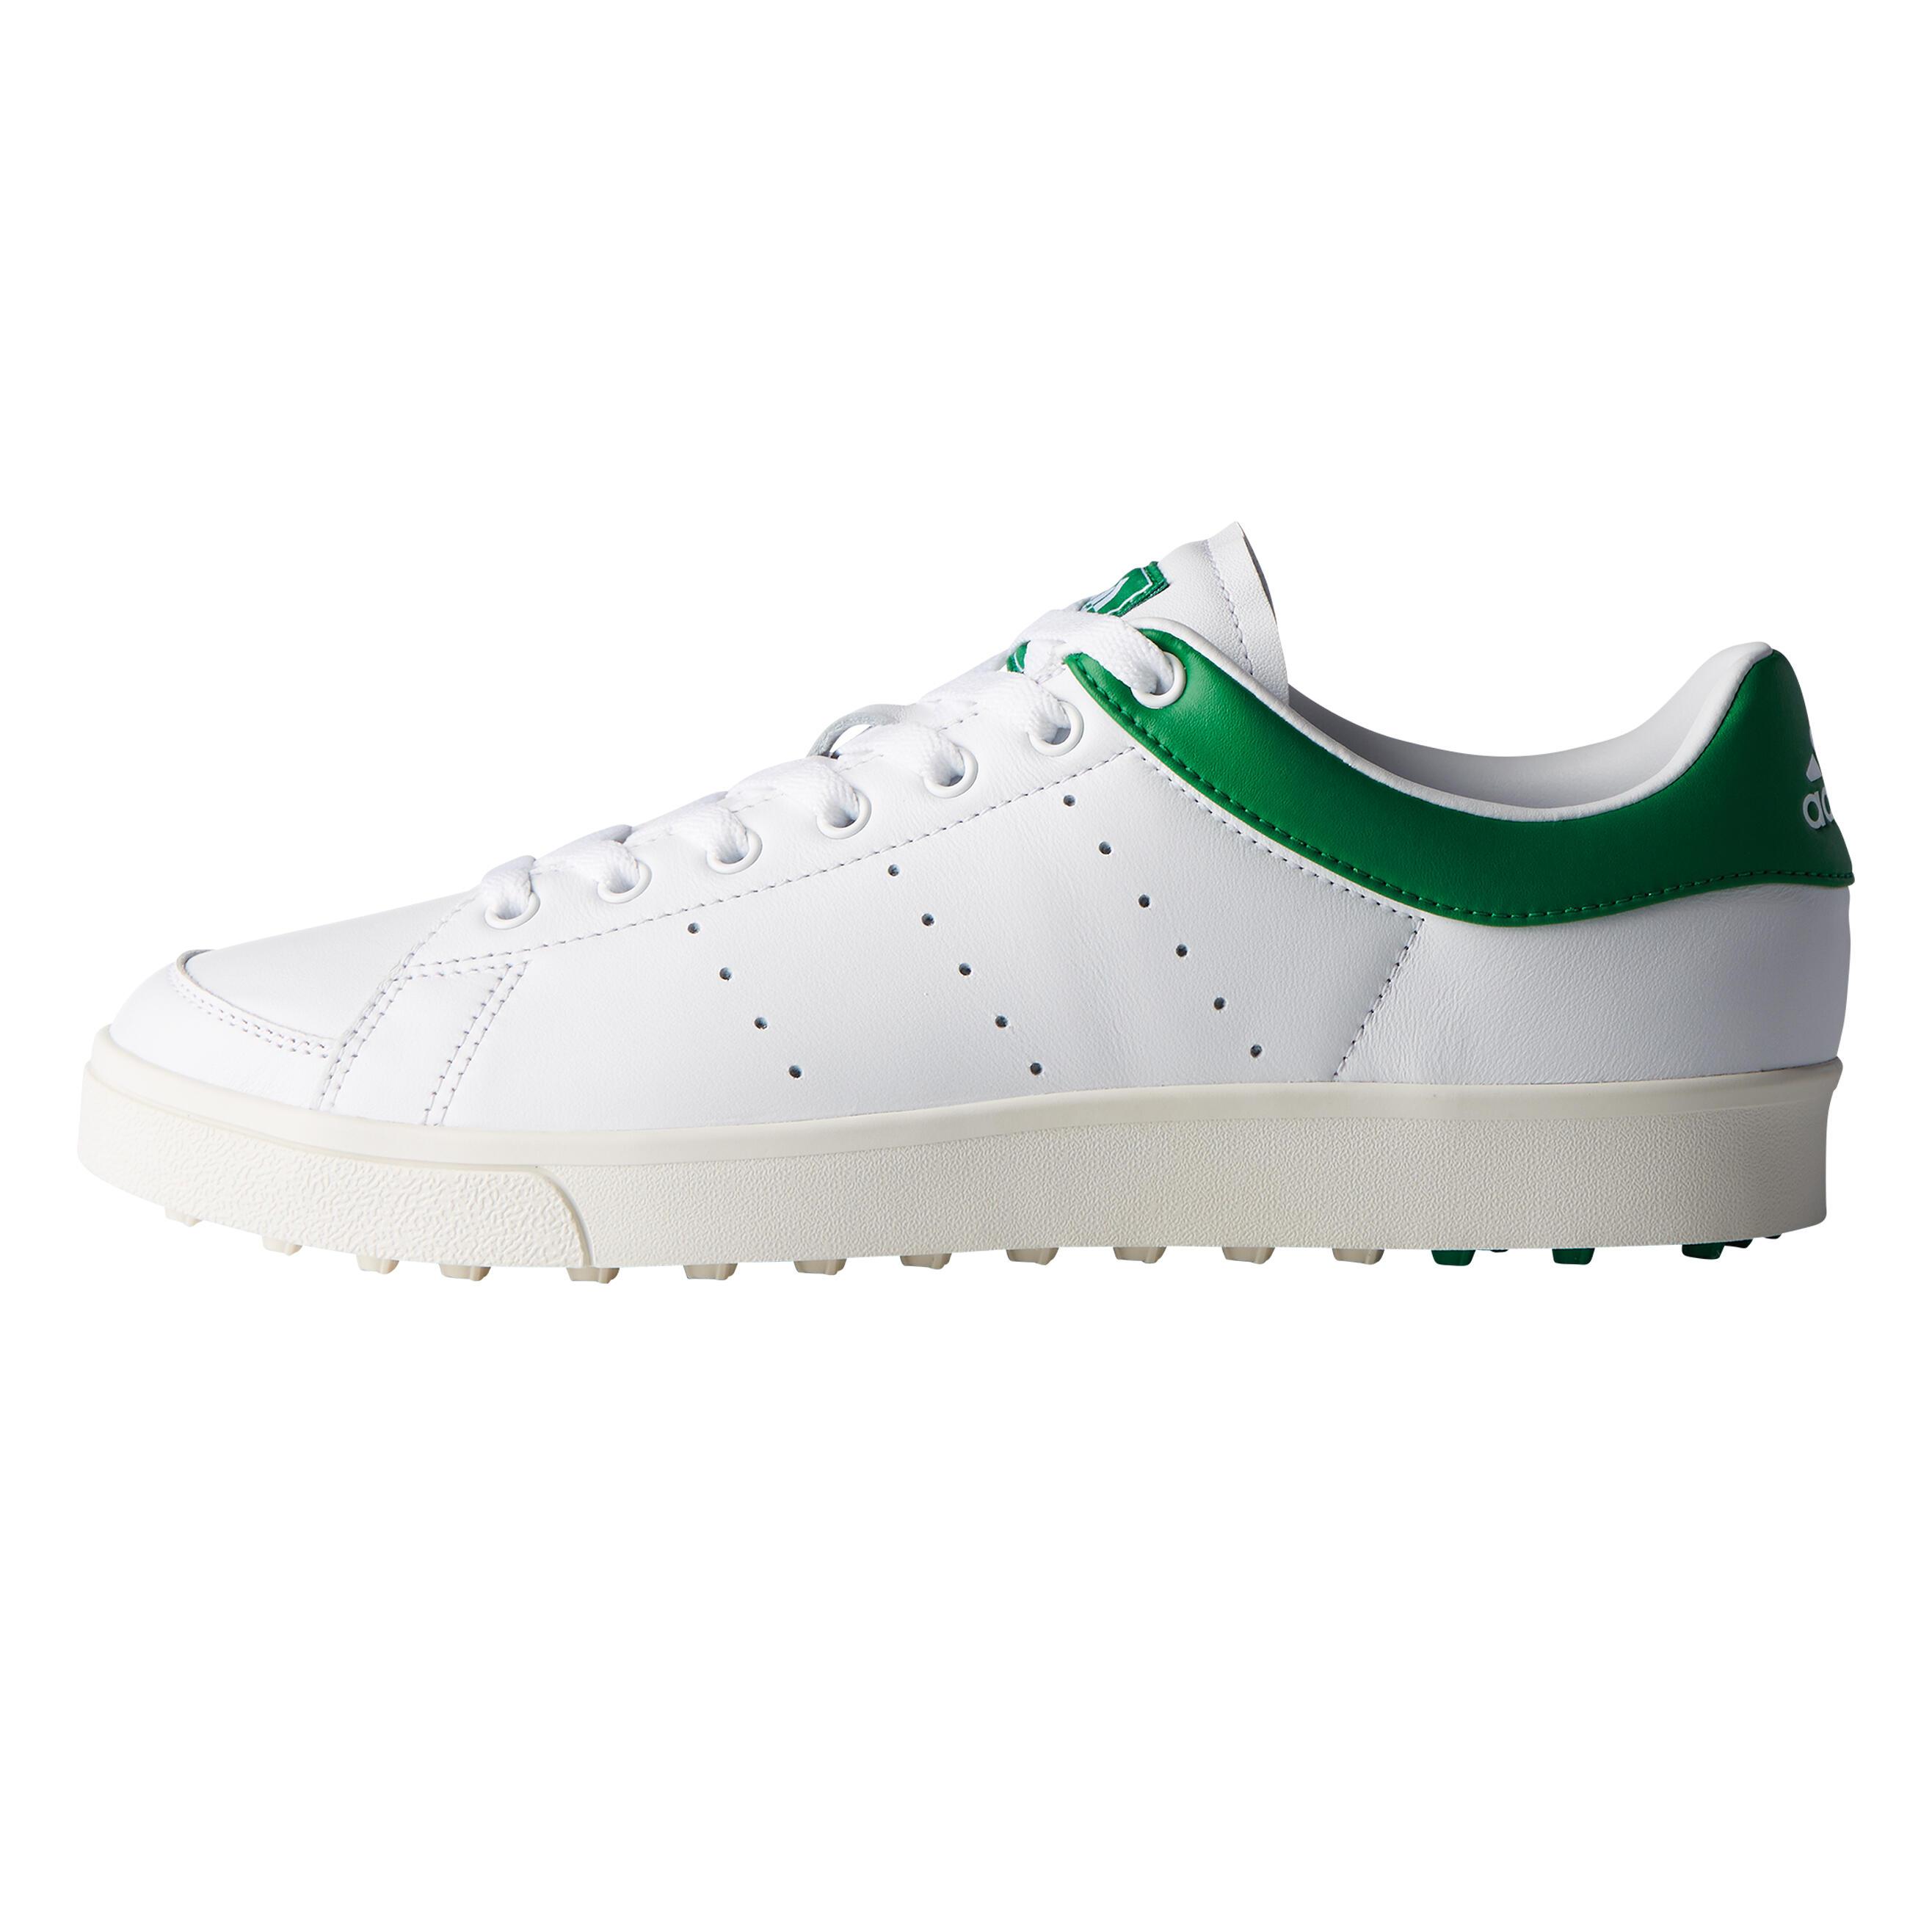 Chaussures de golf Adidas | Decathlon